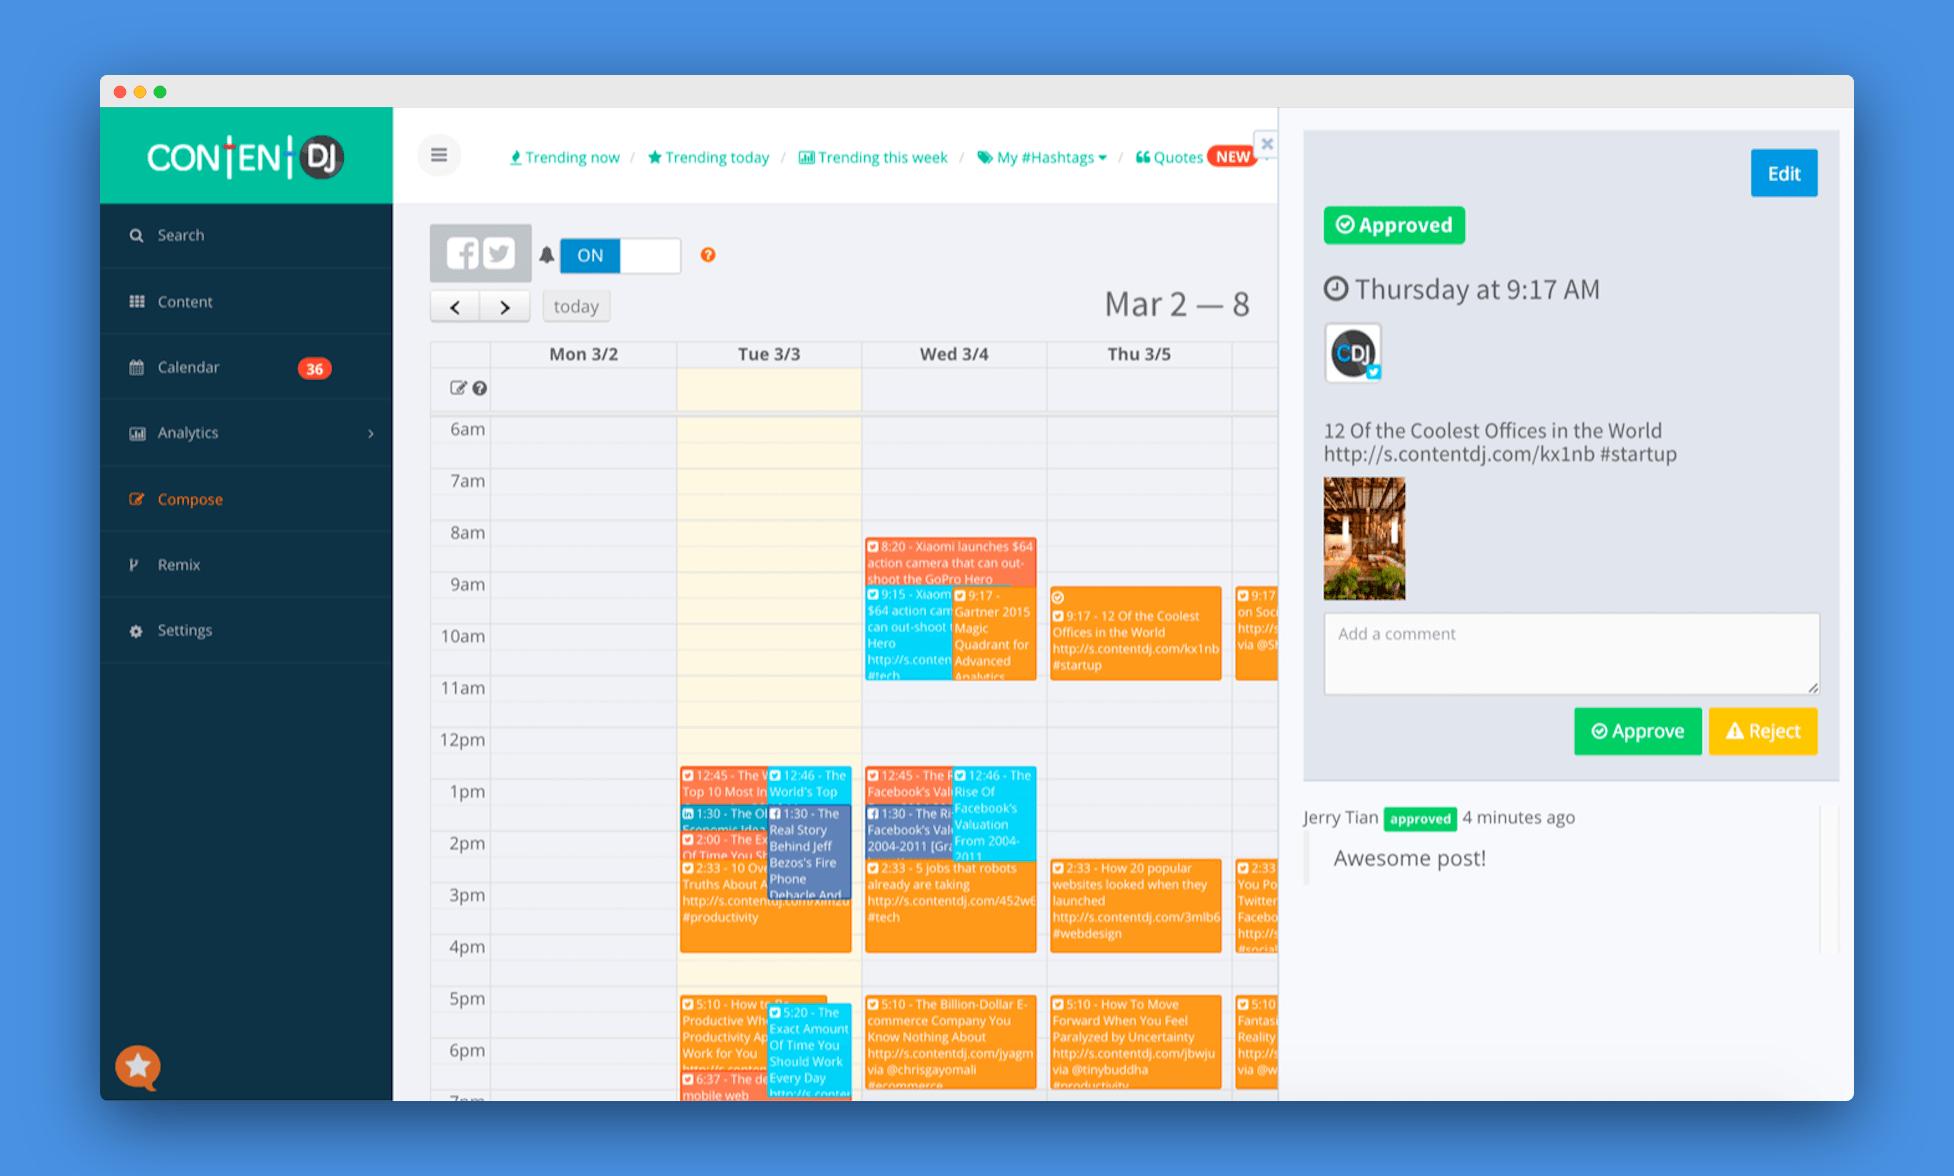 content dj editorial calendar